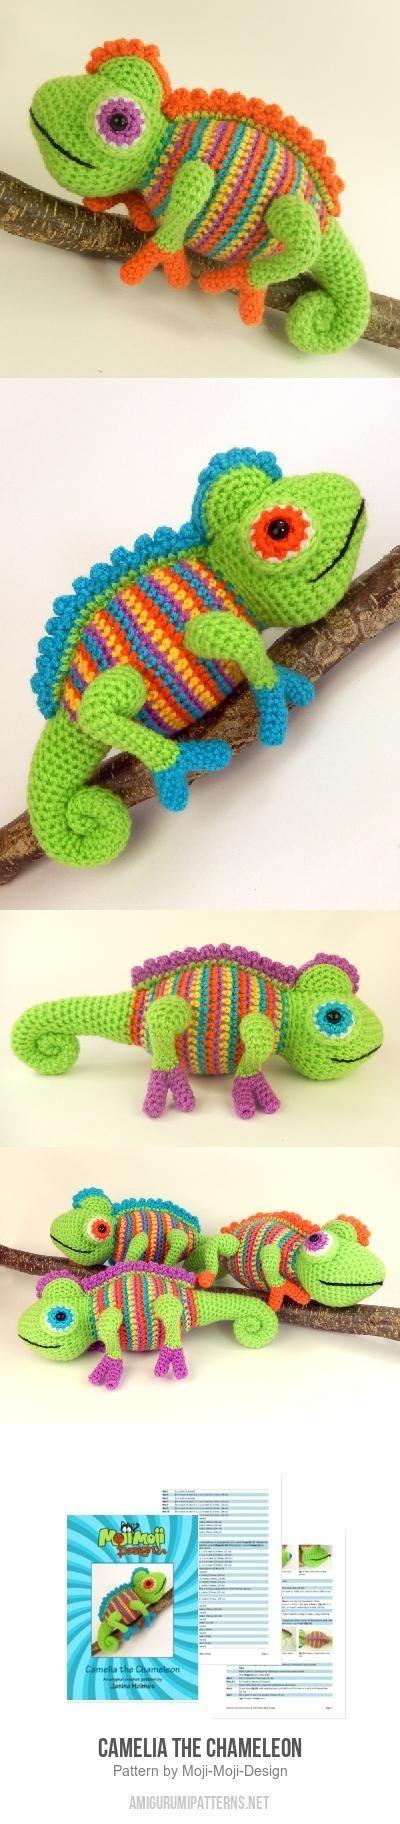 Amigurumi Chameleon Free Crochet Pattern Crochet Patterns Free